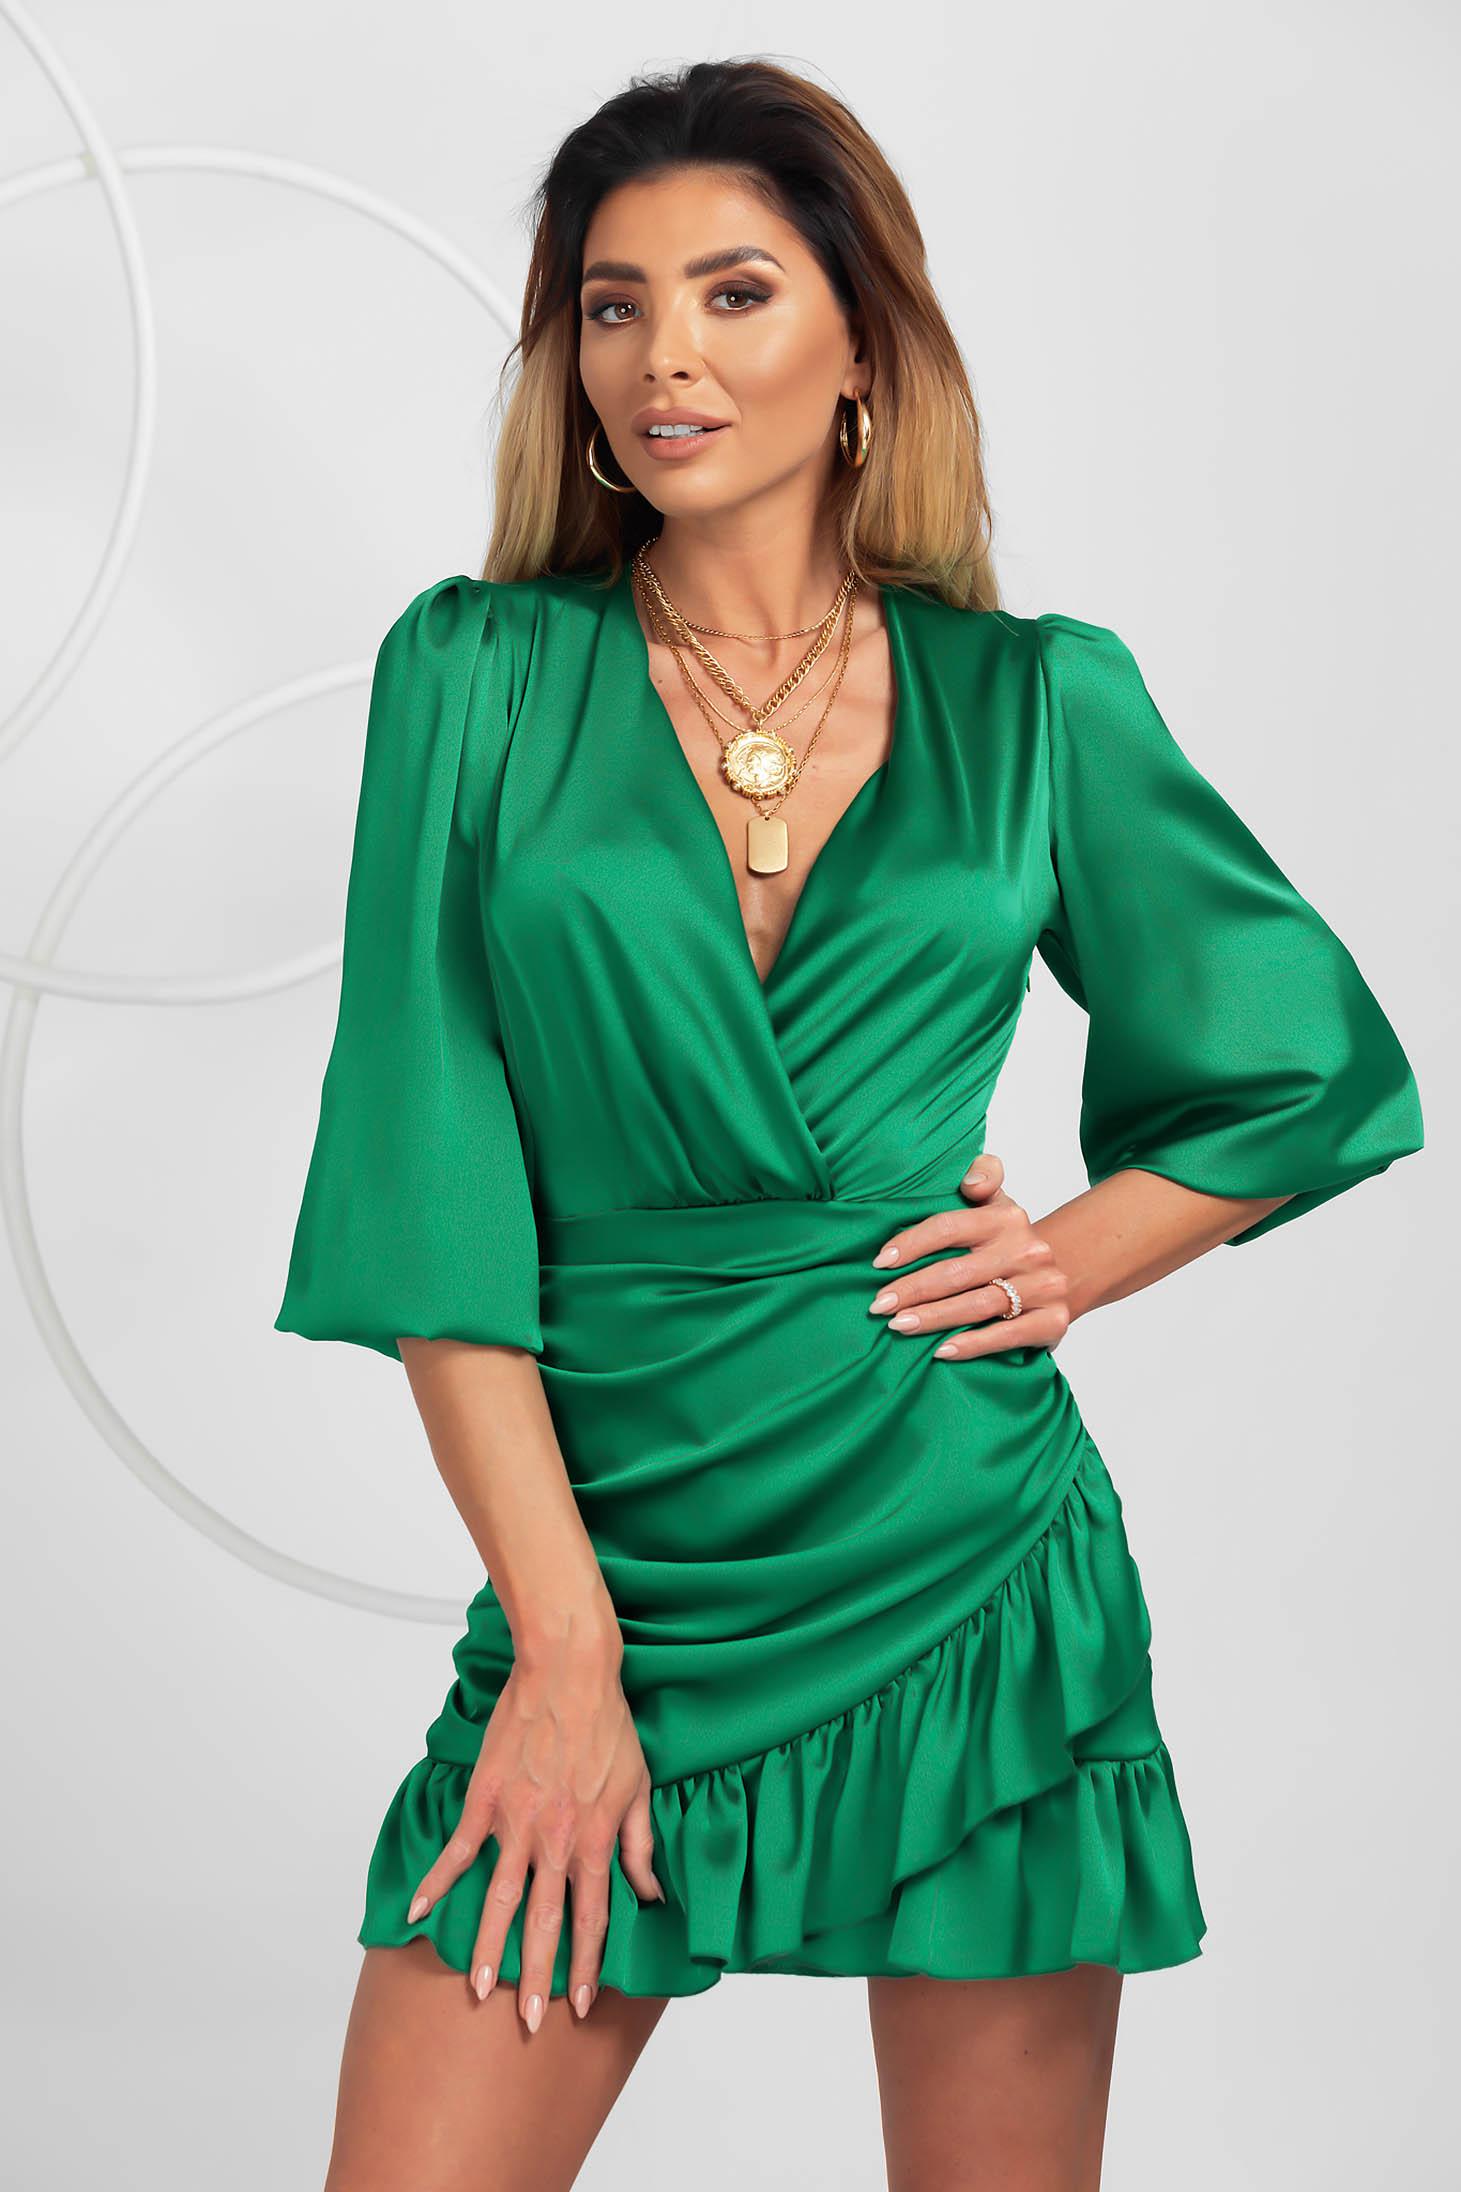 Rochie PrettyGirl verde de party din satin decolteu petrecut cu volanase